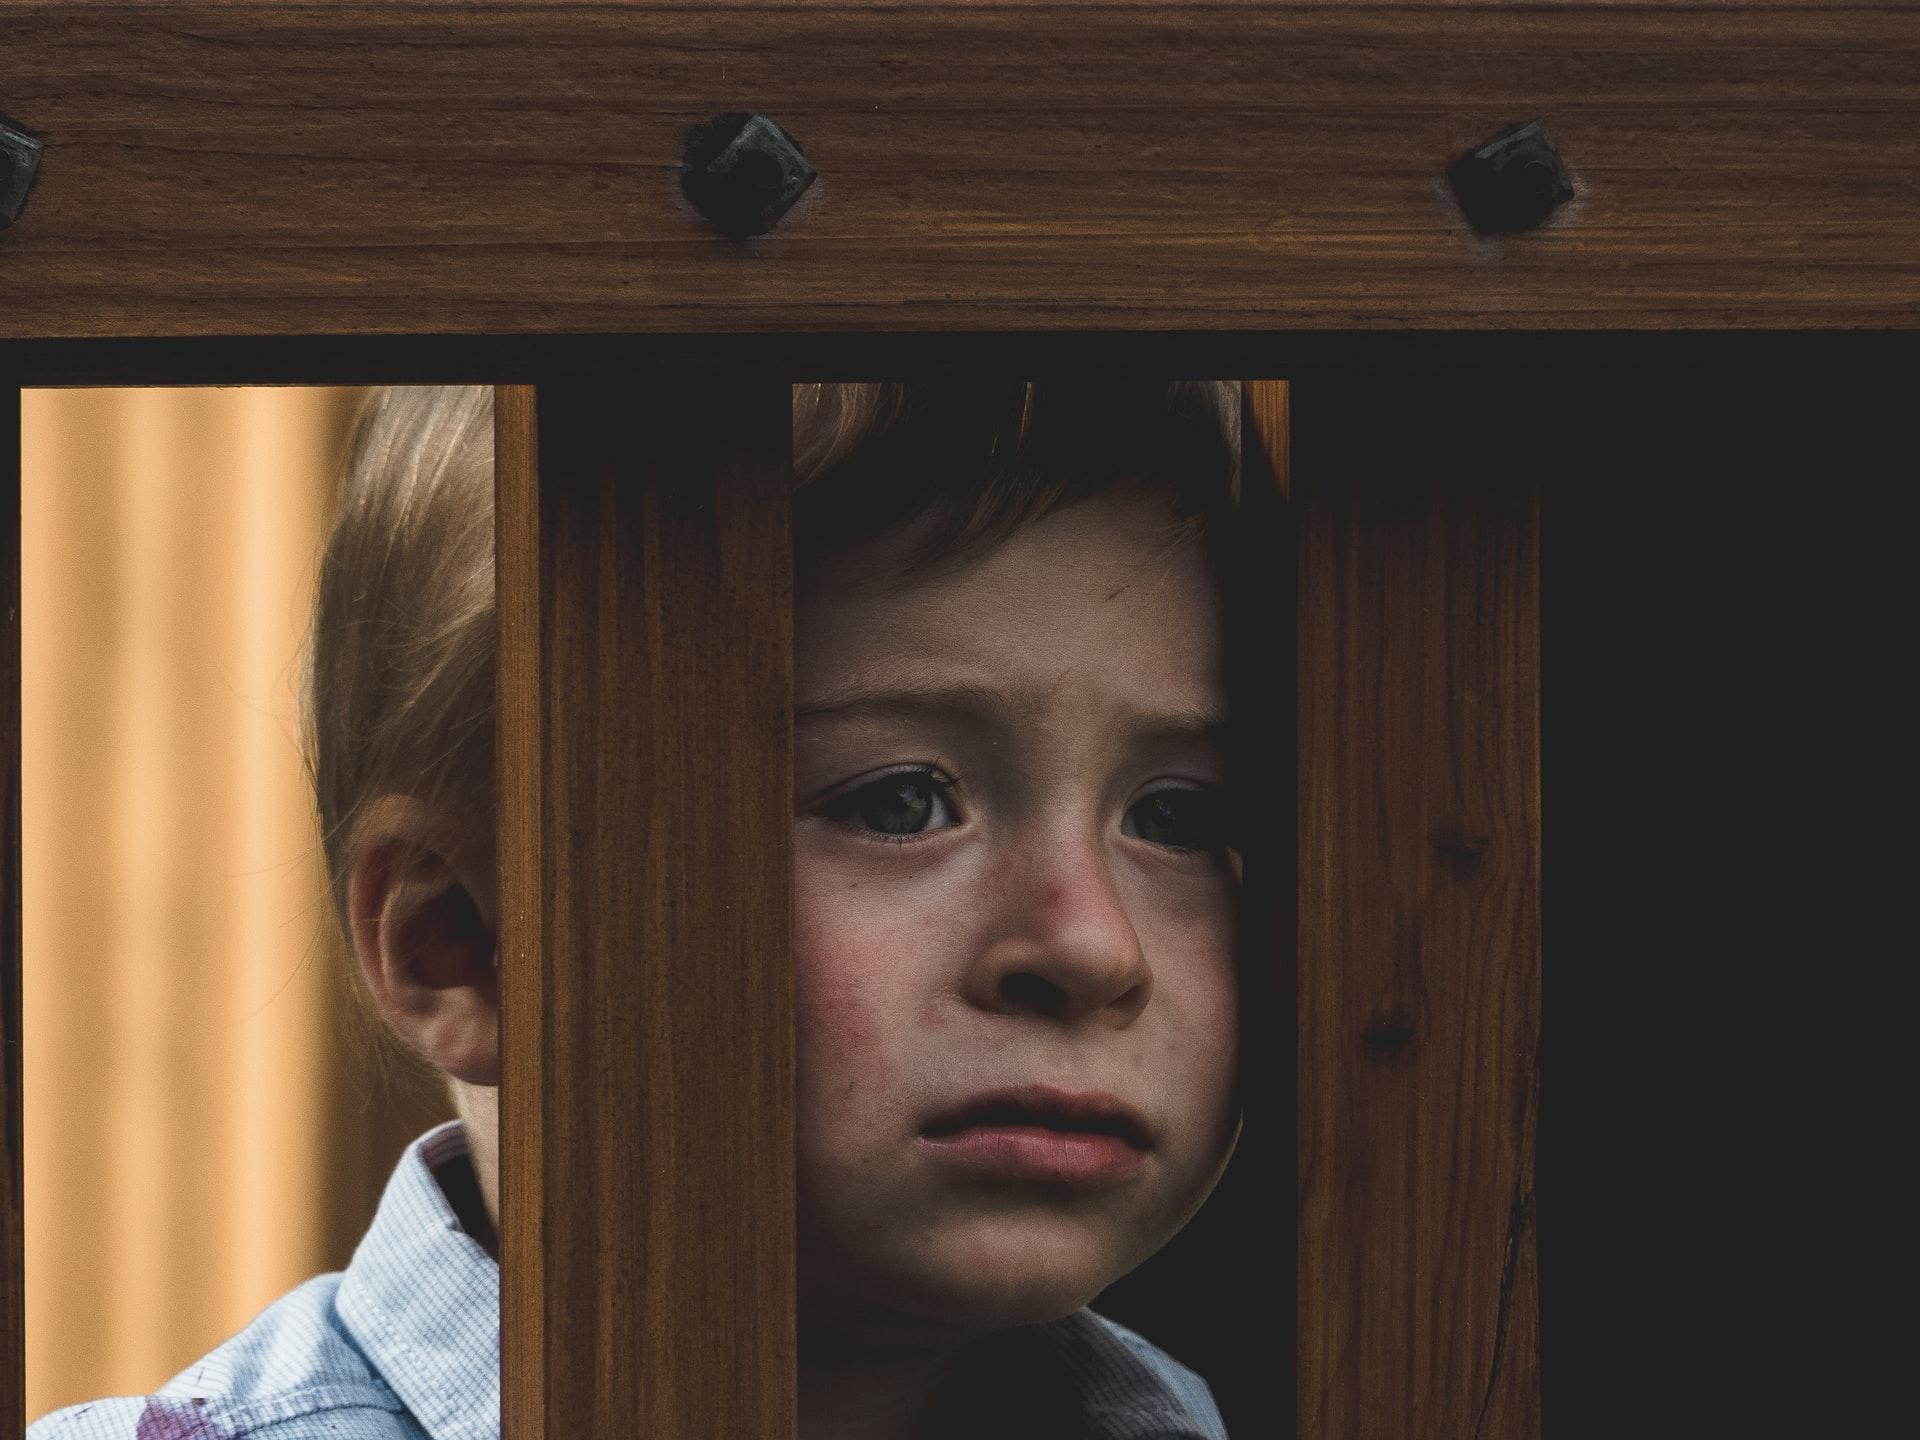 Mental health crisis emerges among U.S. kids